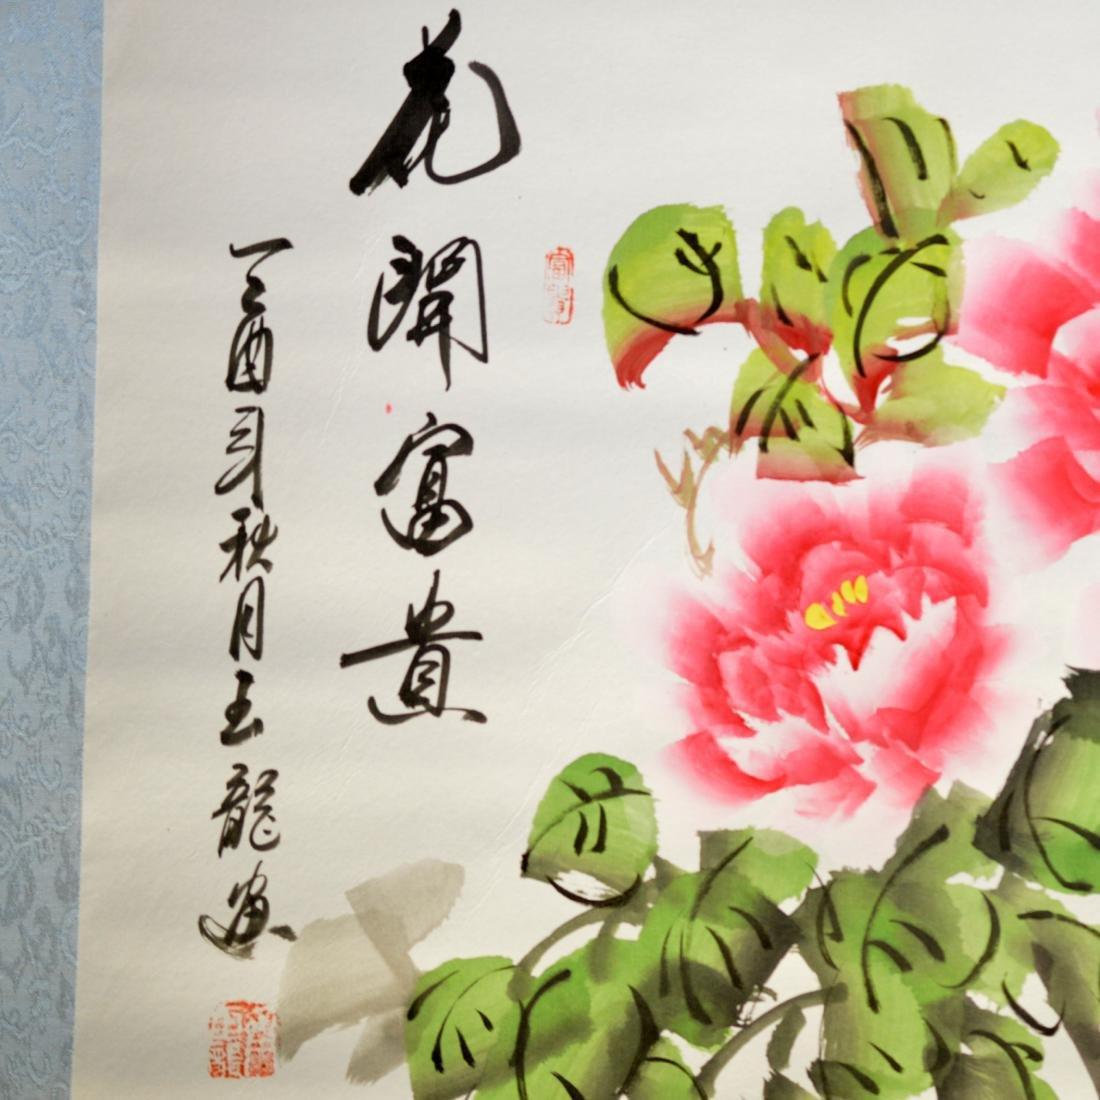 Flower Blossom Painting - 3